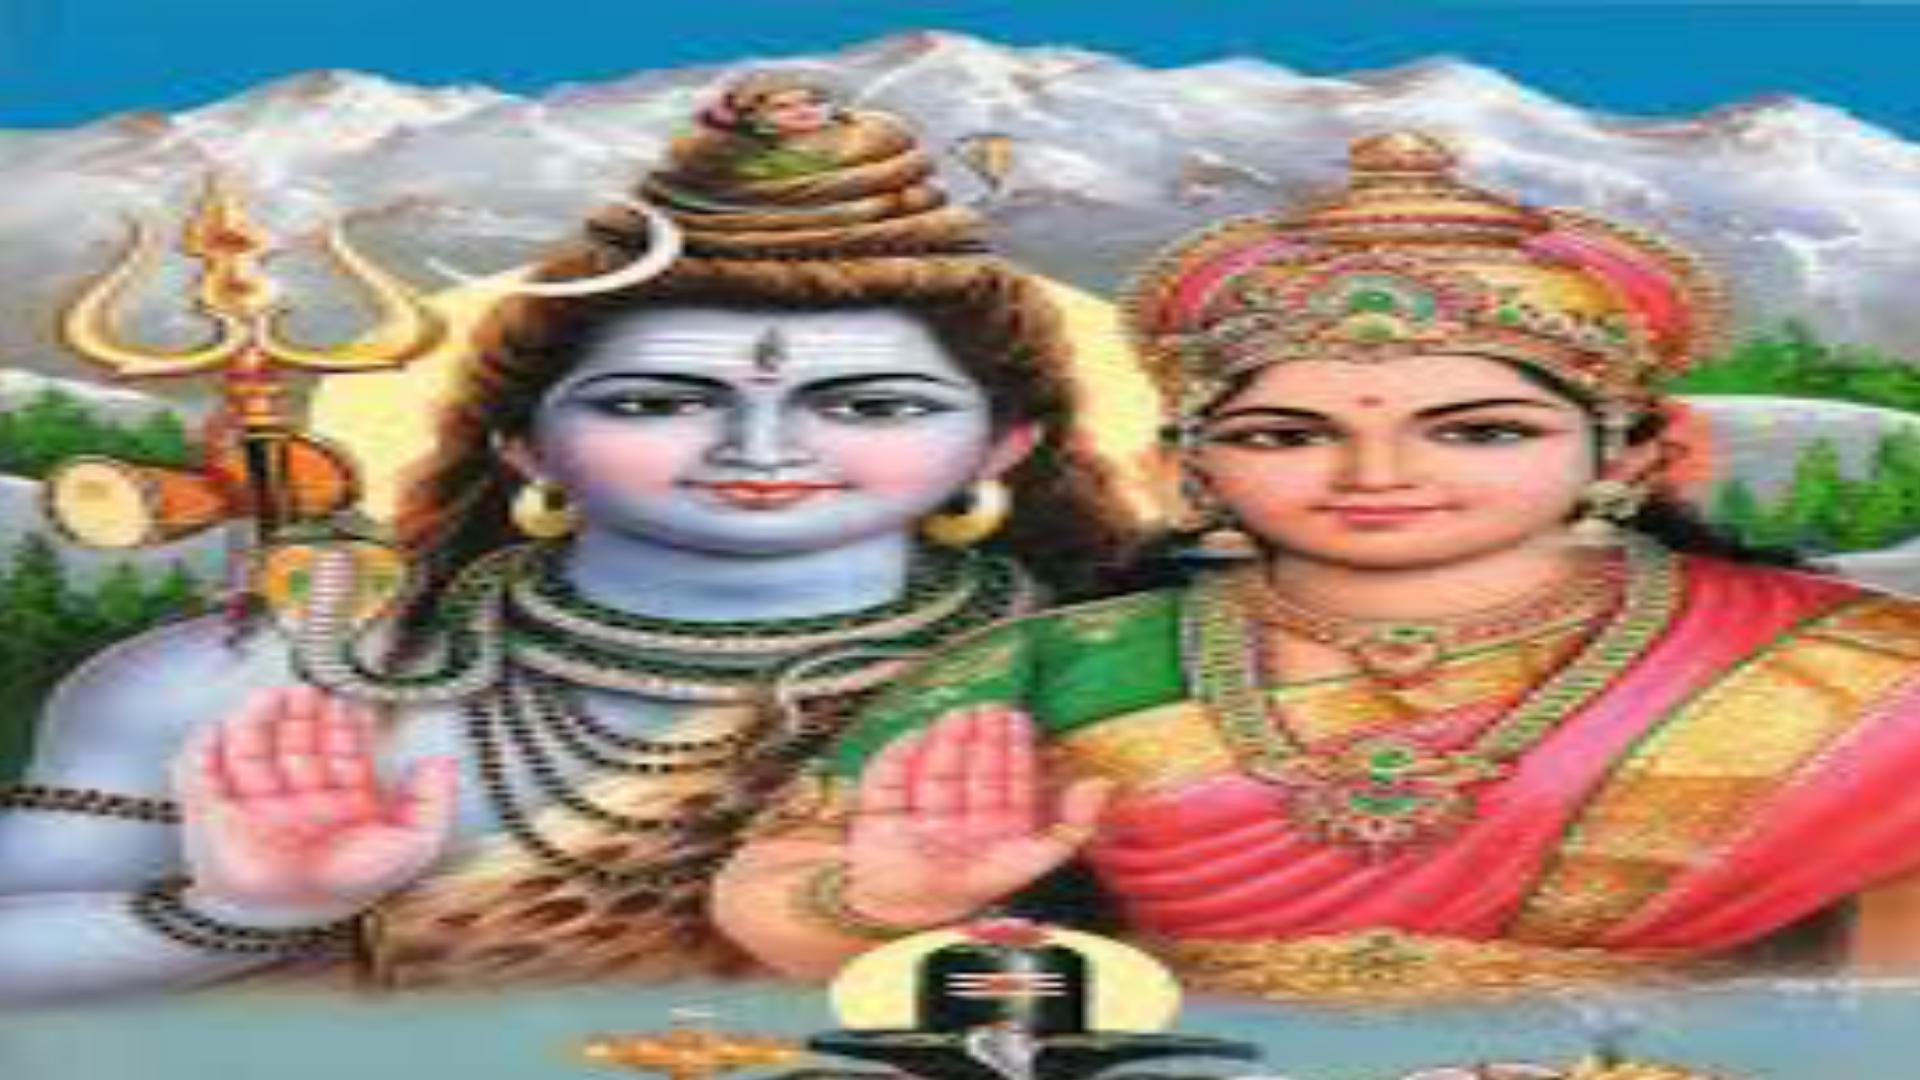 Mahashivratri vrat Katha - शिवरात्रि की कहानी